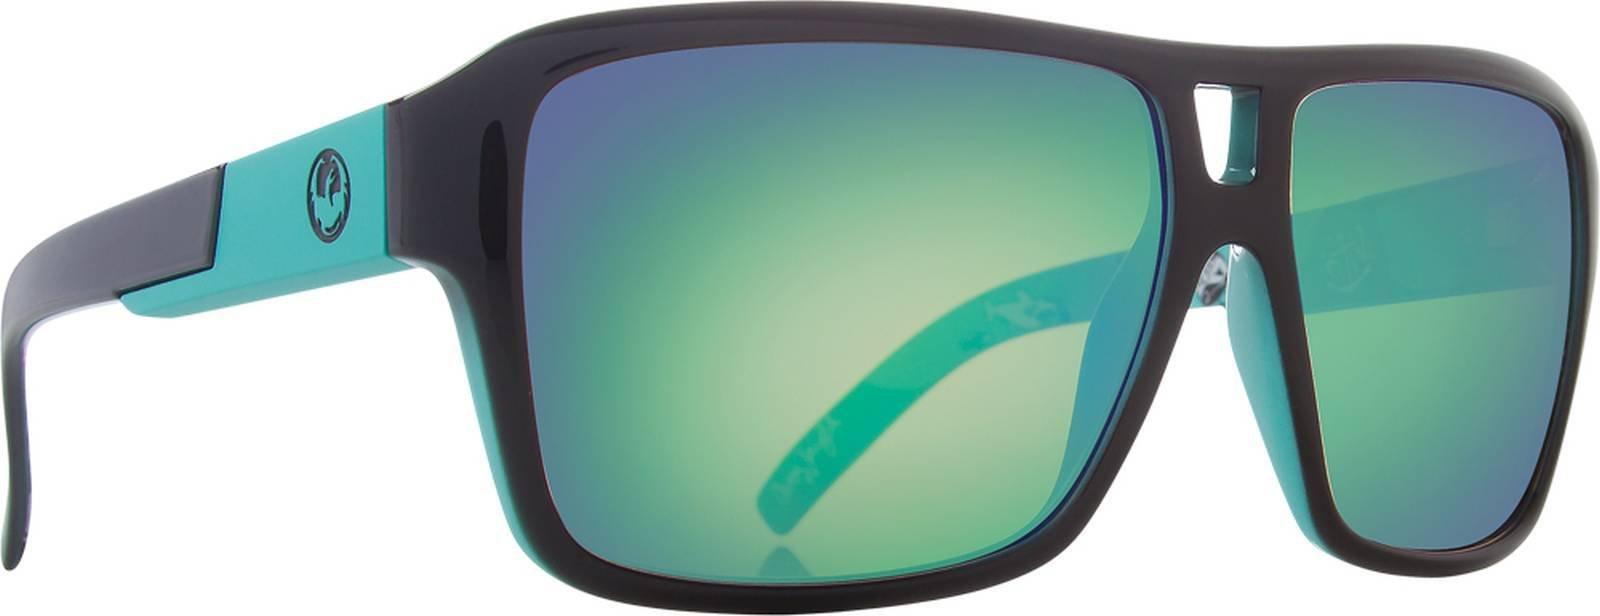 Dragon Alliance The Jam Sunglasses Owen Wright w/ Green Ion Mirror (720-1999) Authentic